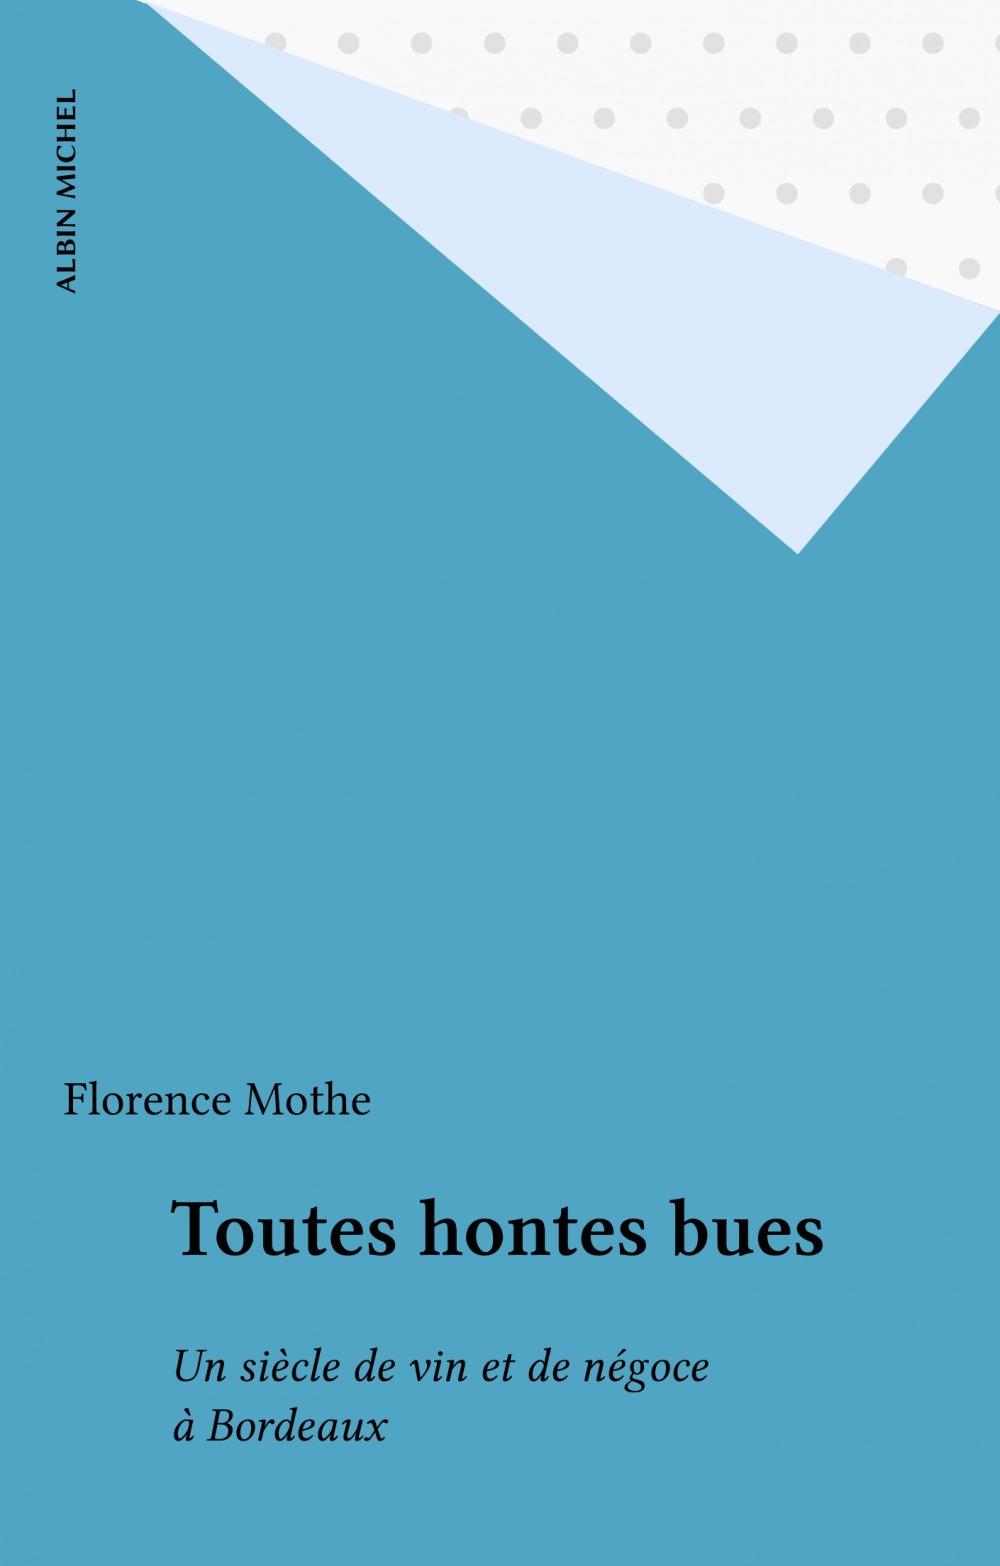 Toutes hontes bues  - Florence Mothe